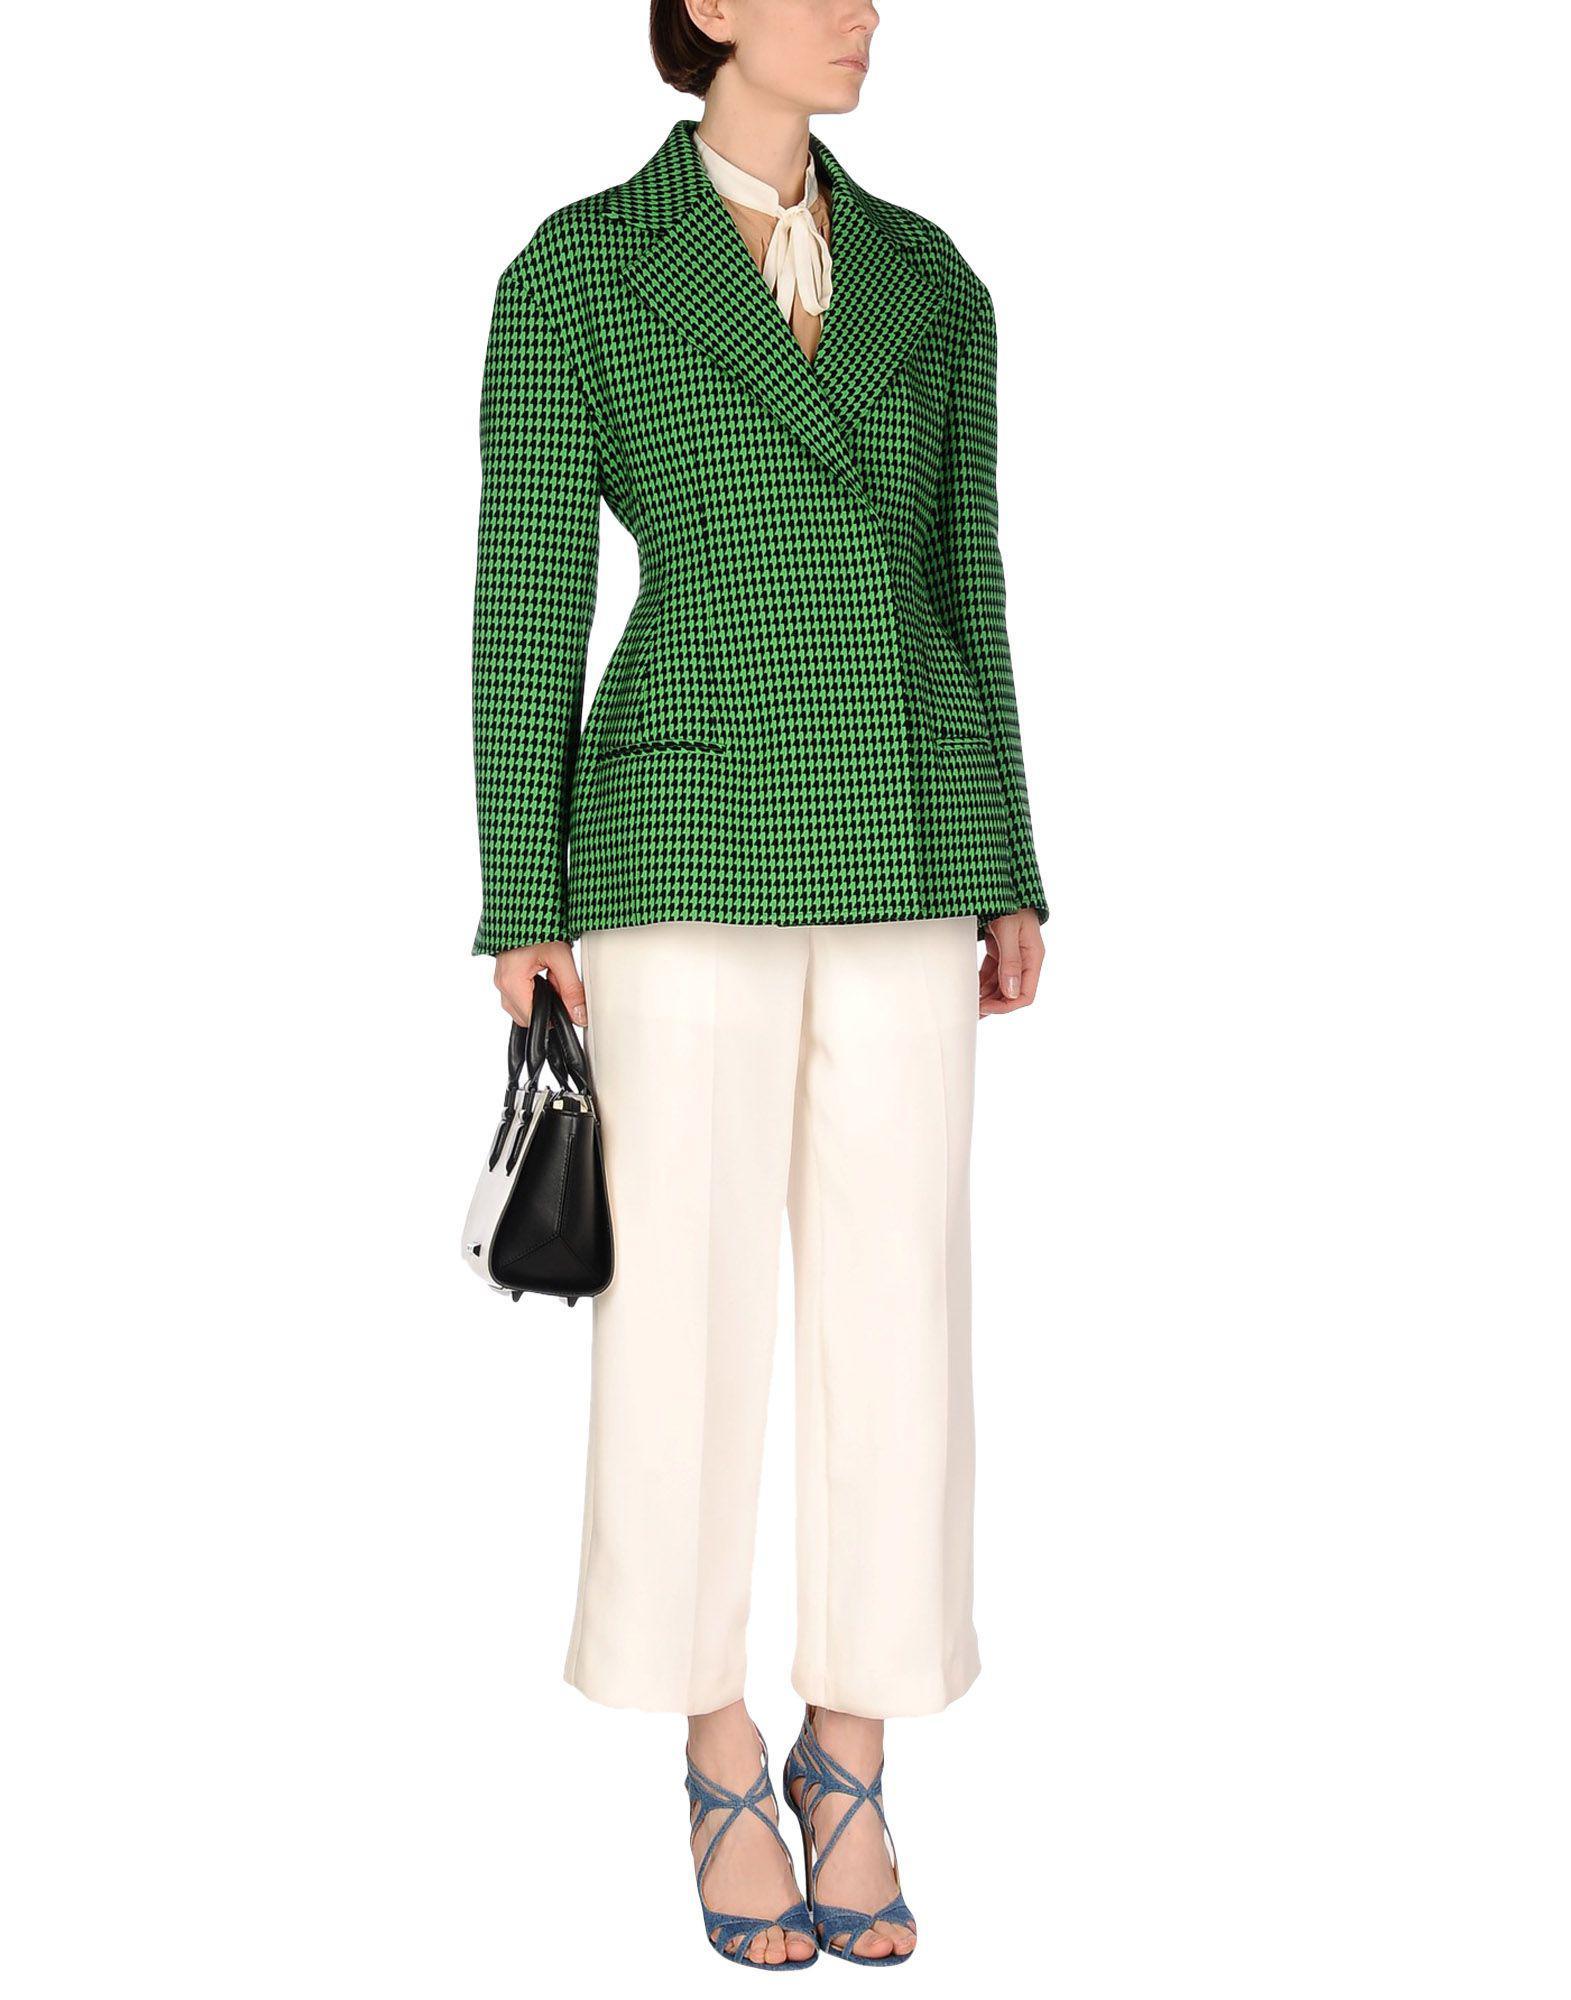 Celine Cotton Blazers in Green